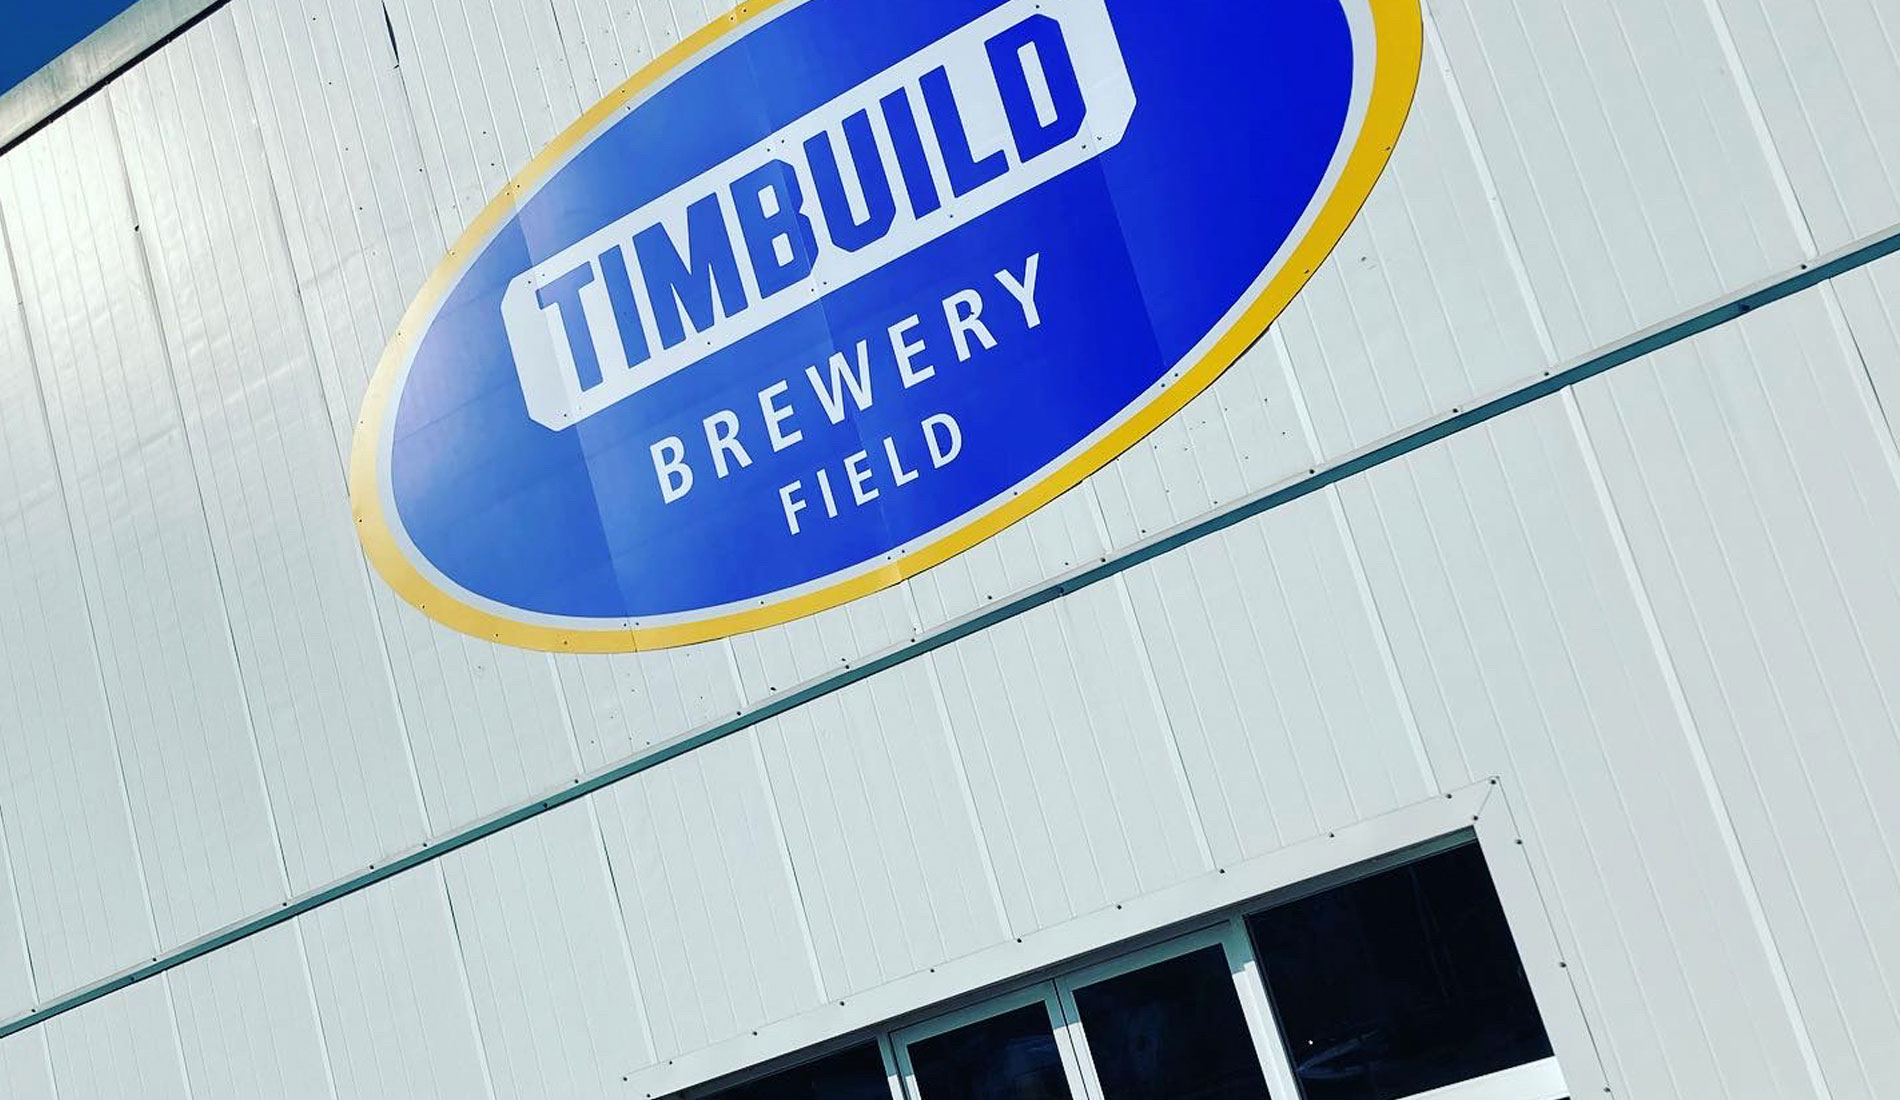 Timbuild Brewery Field Stadium Branding